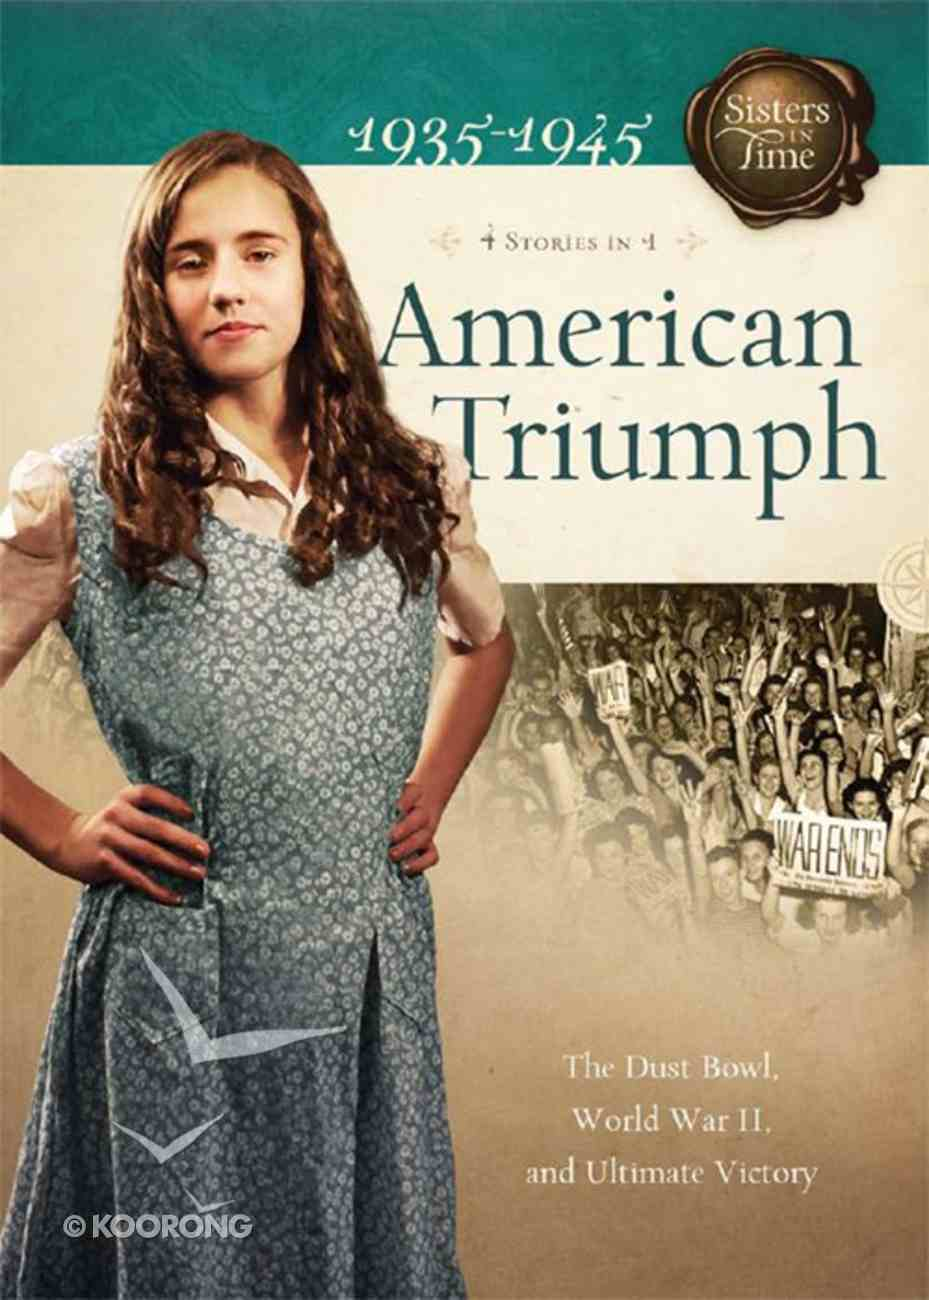 American Triumph (4 in 1) (Sisters In Time Series) eBook